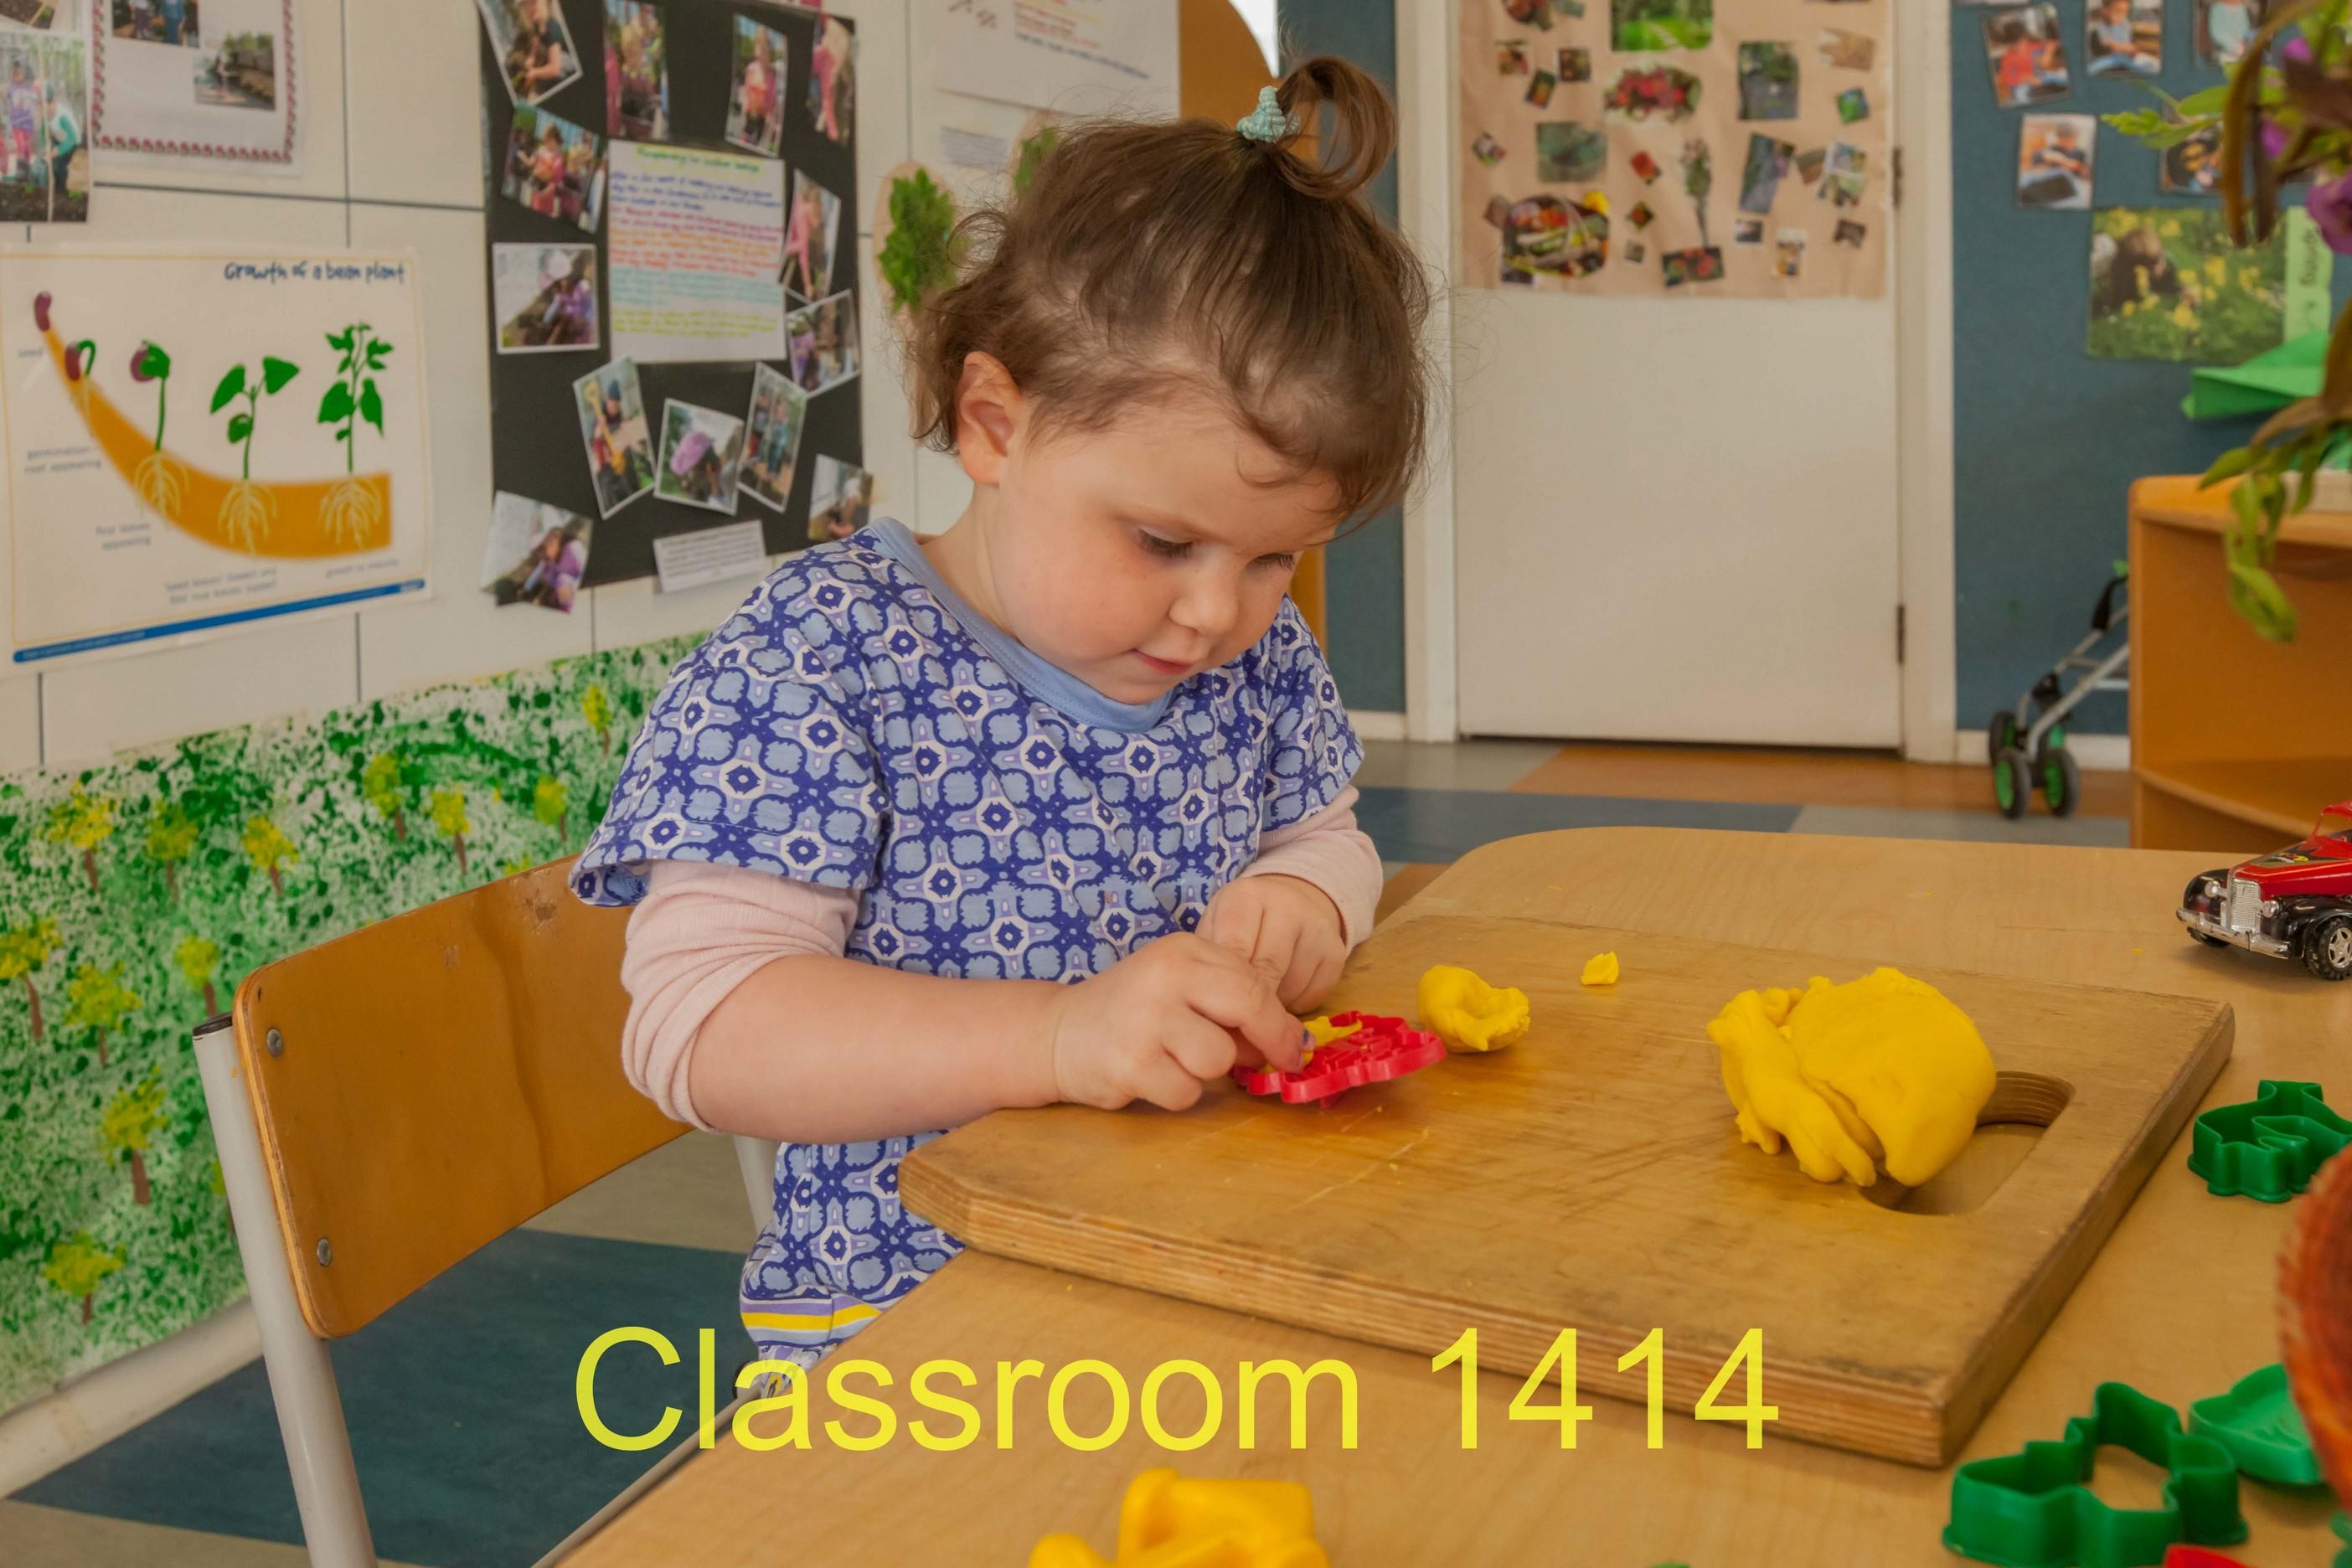 Classroom 1414